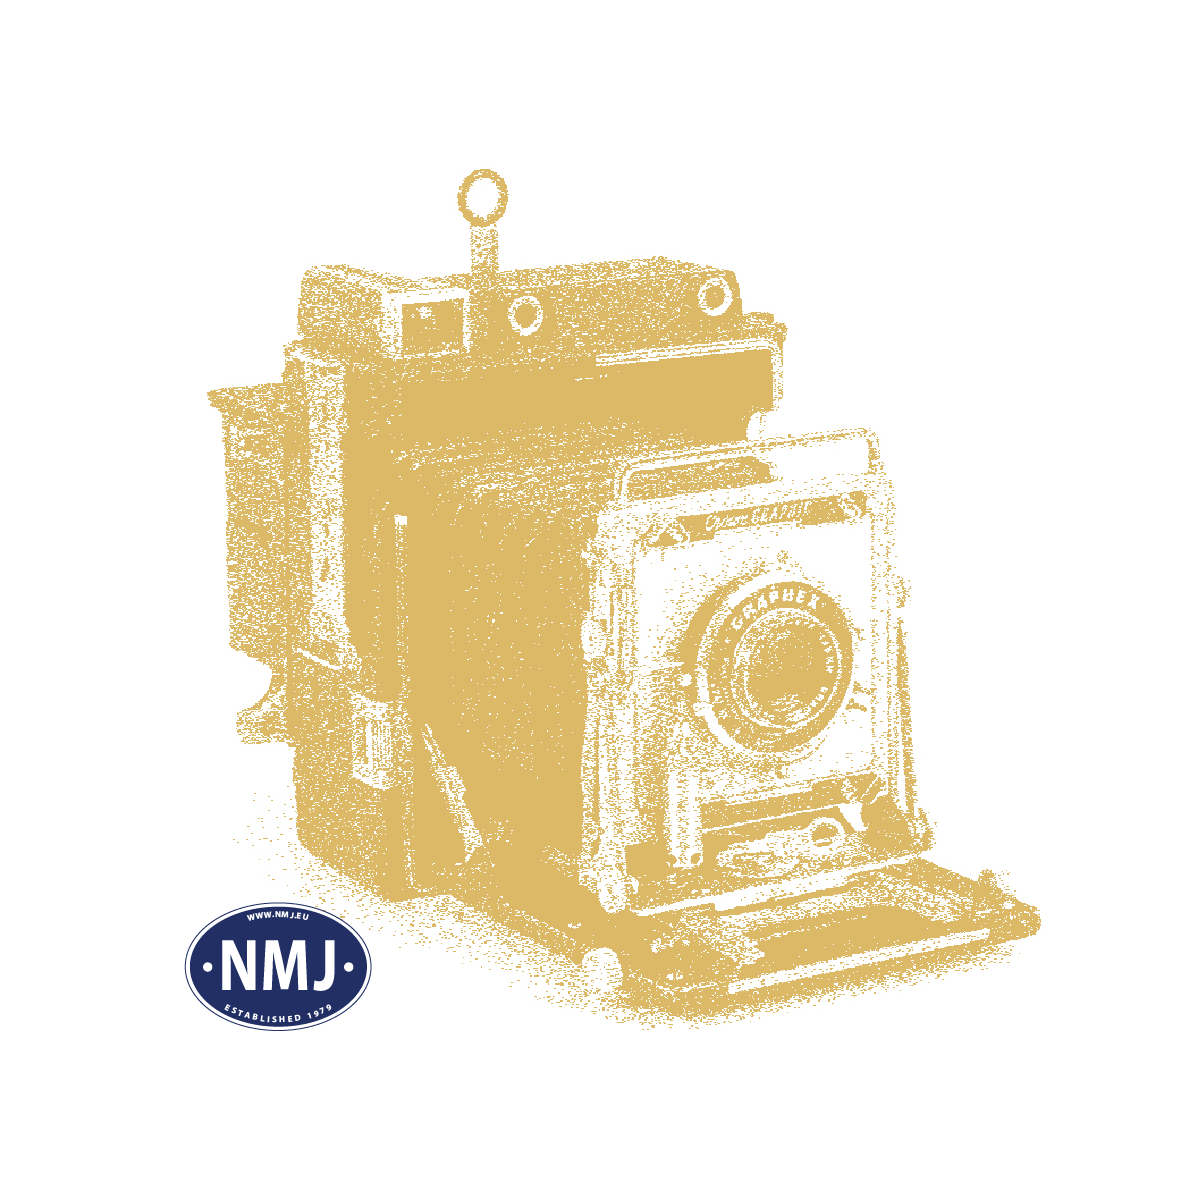 NMJT83.202 - NMJ Topline NSB SKD224.216, Rød/gul